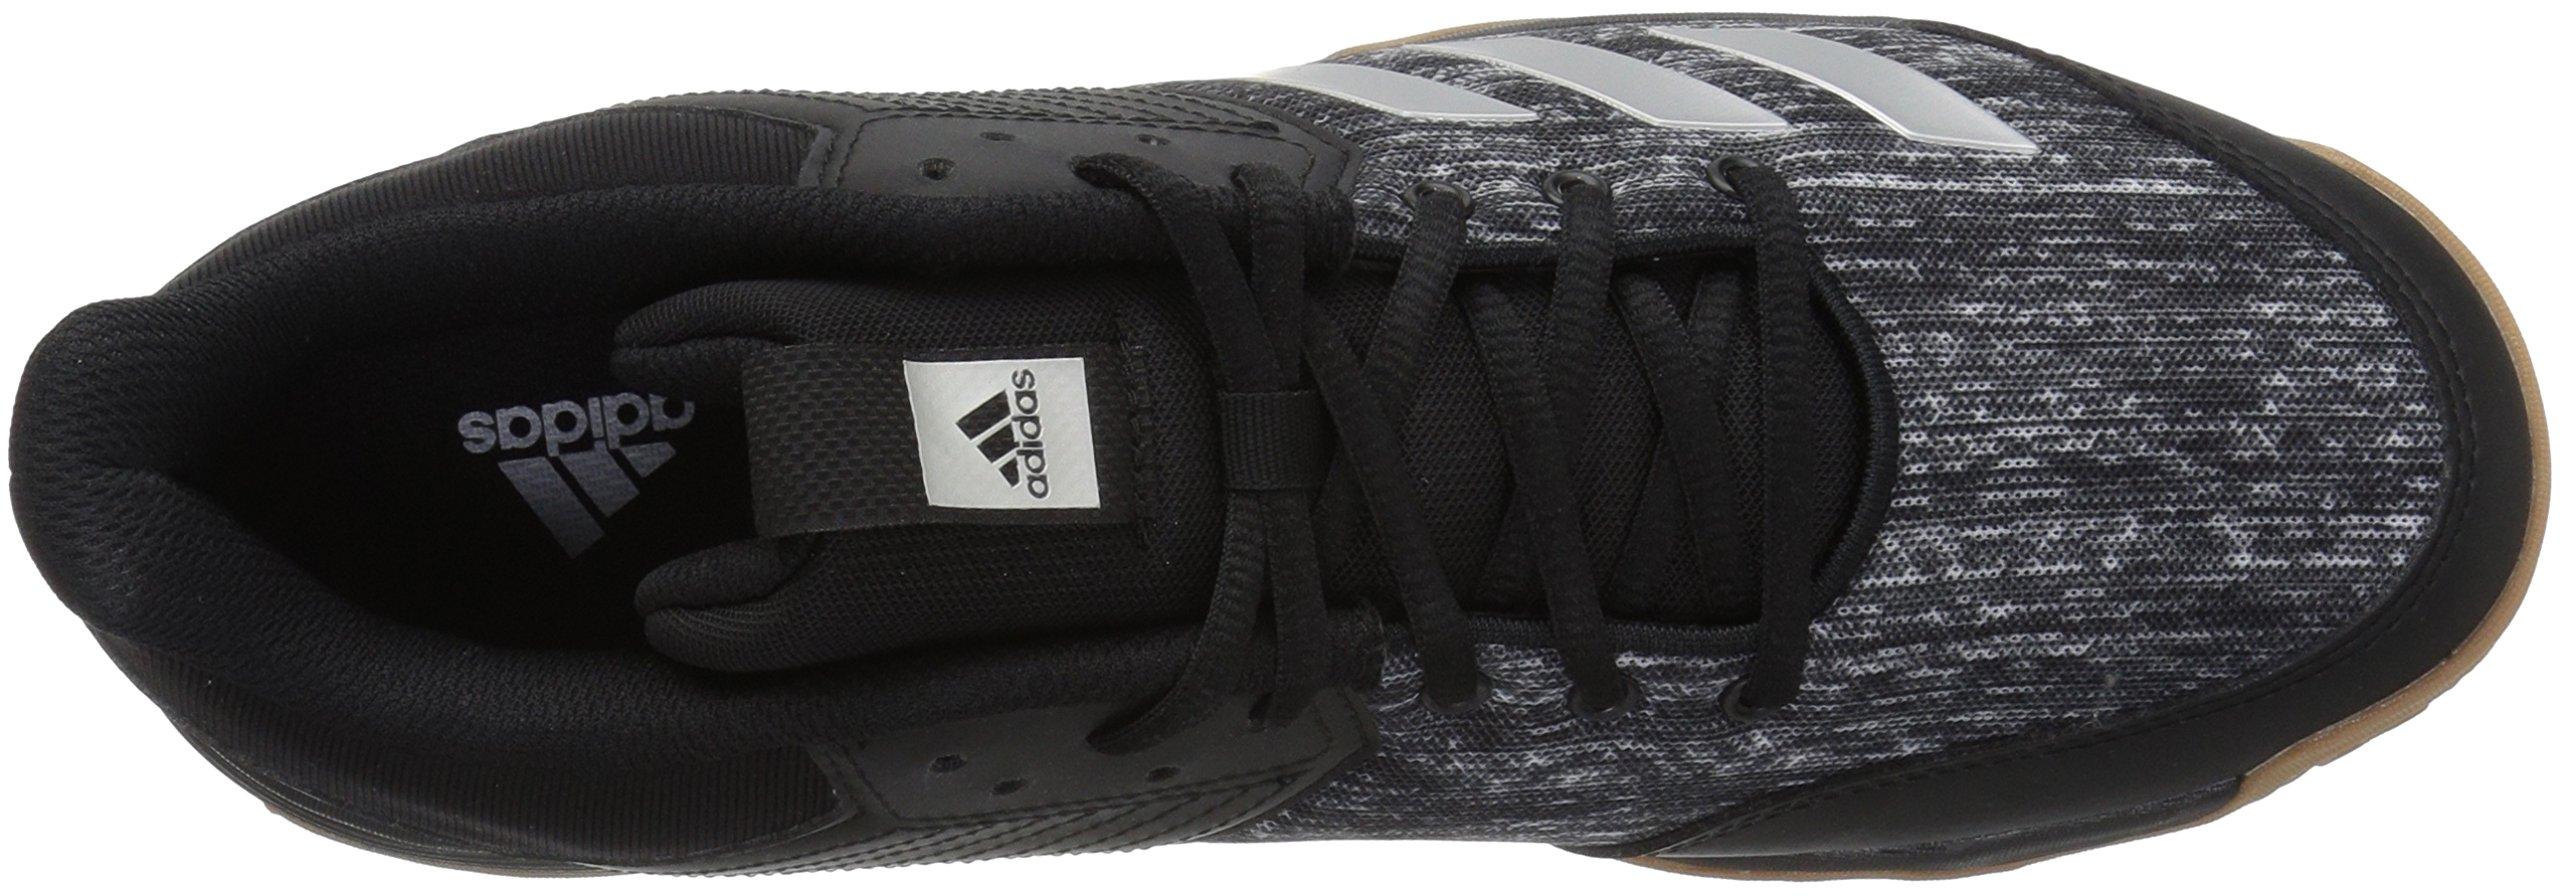 adidas Women's Ligra 6 Volleyball Shoe, Black/Silver Metallic/White, 7 M US by adidas (Image #7)